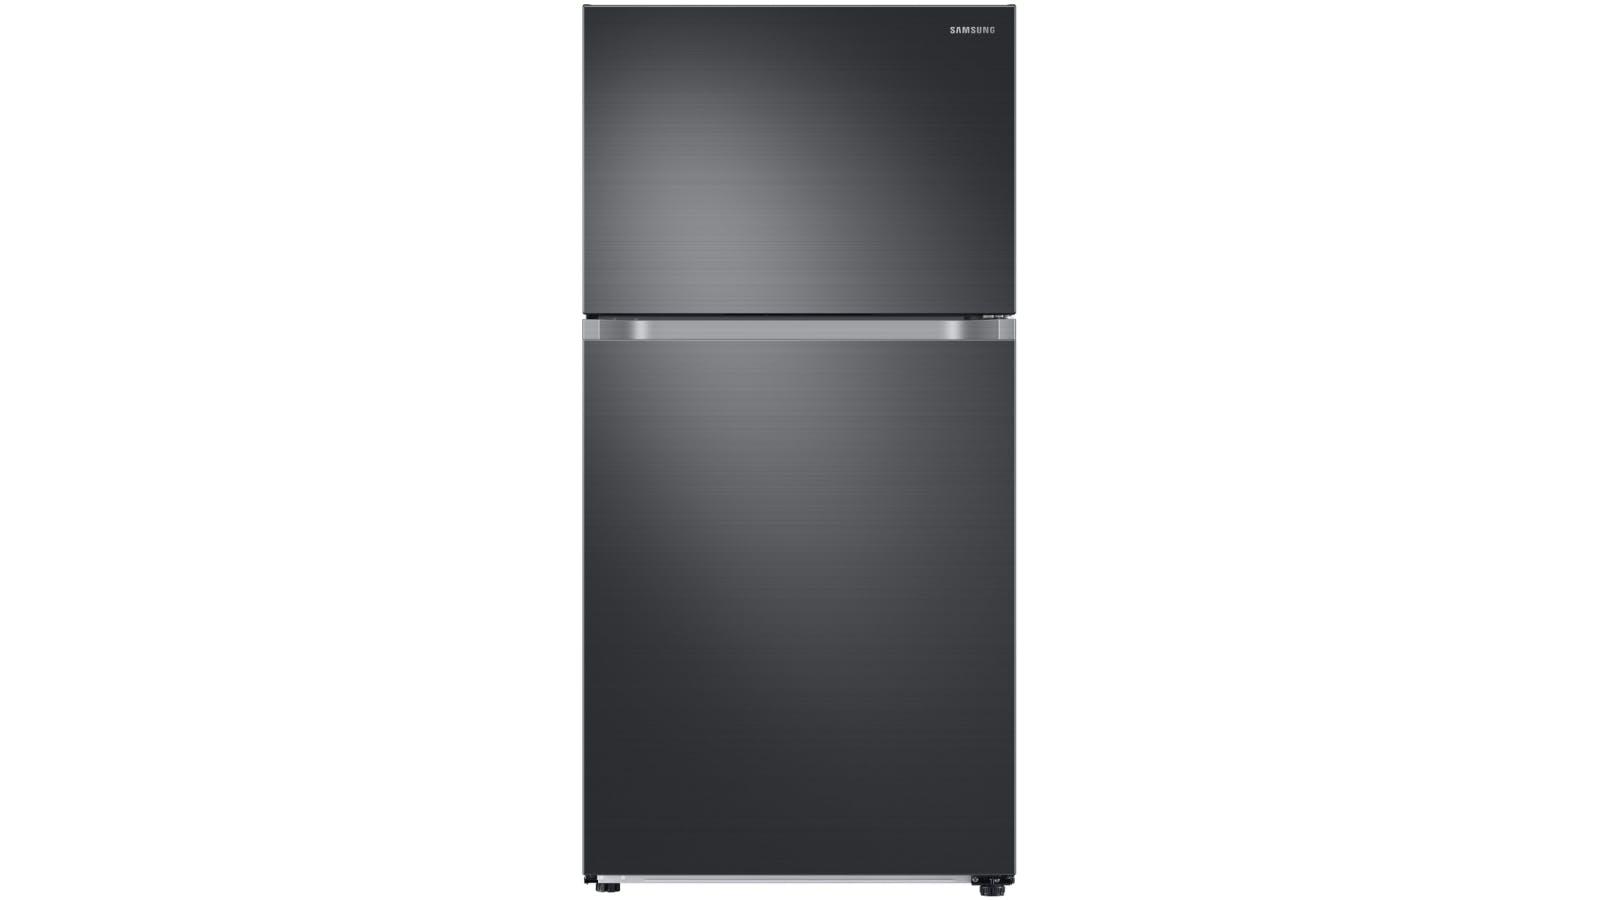 Samsung 628L Top Mount Fridge - Black Stainless Steel   Domayne